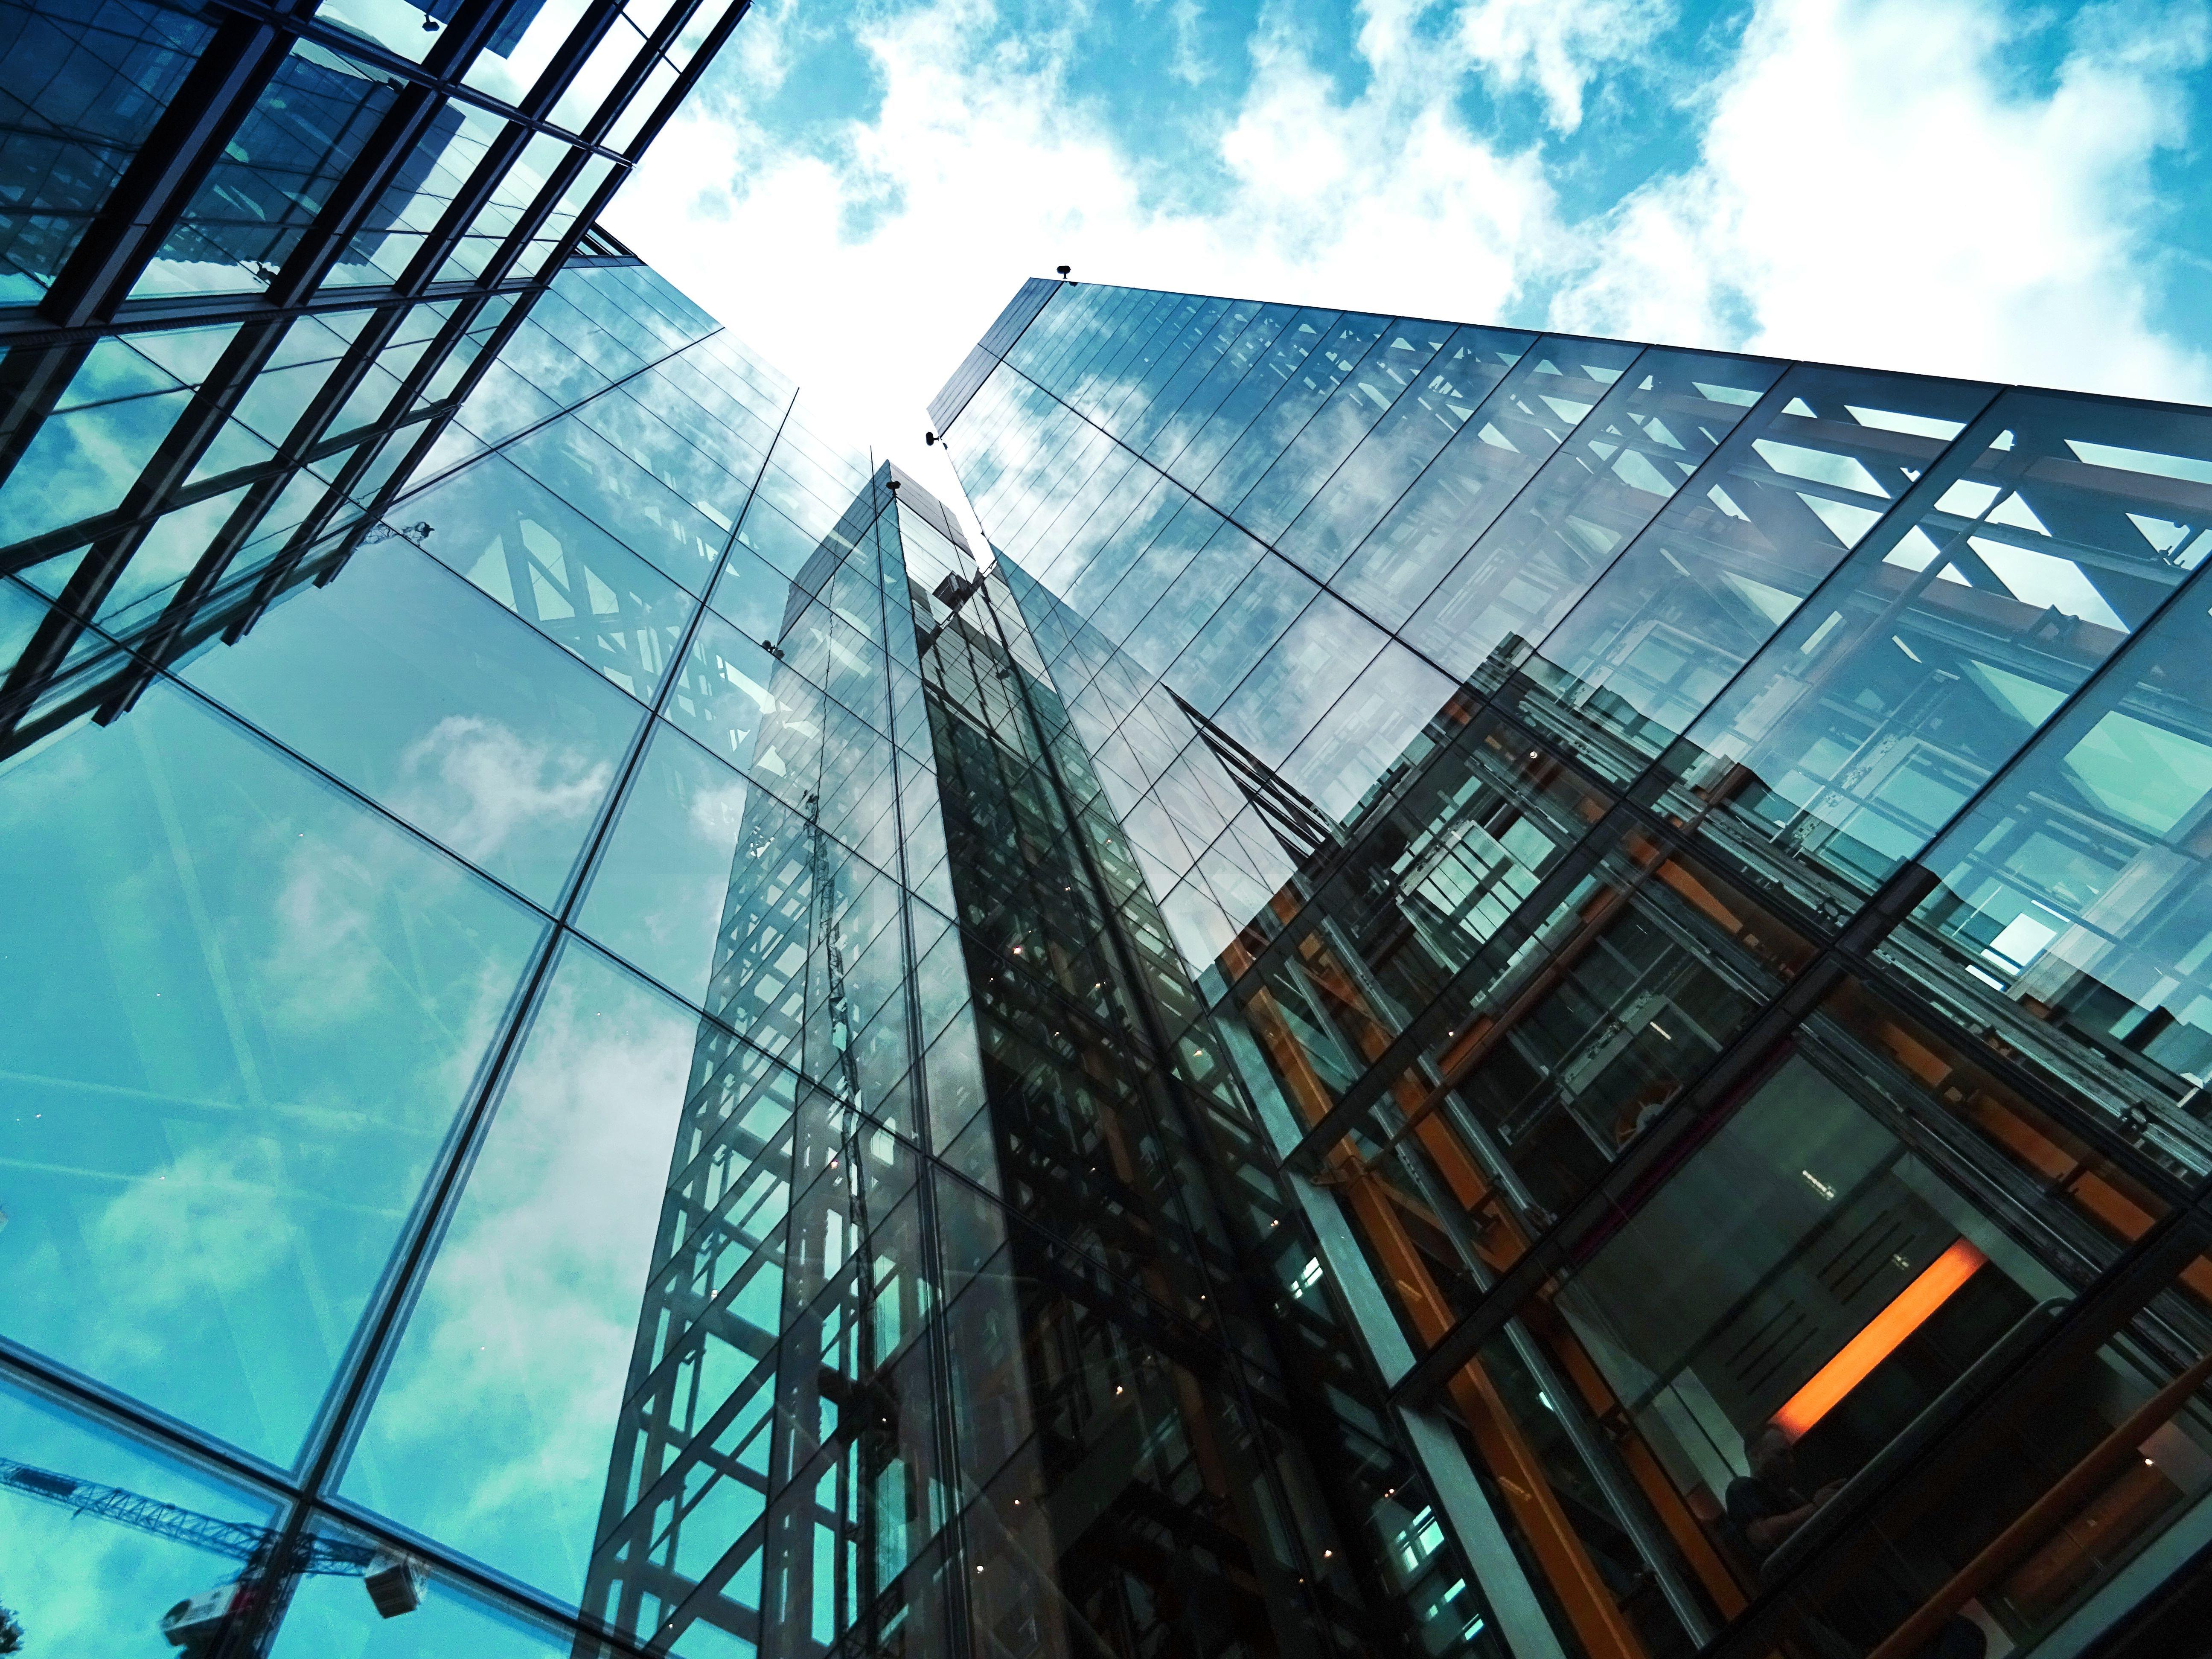 architectural-design-architecture-building-business-443383